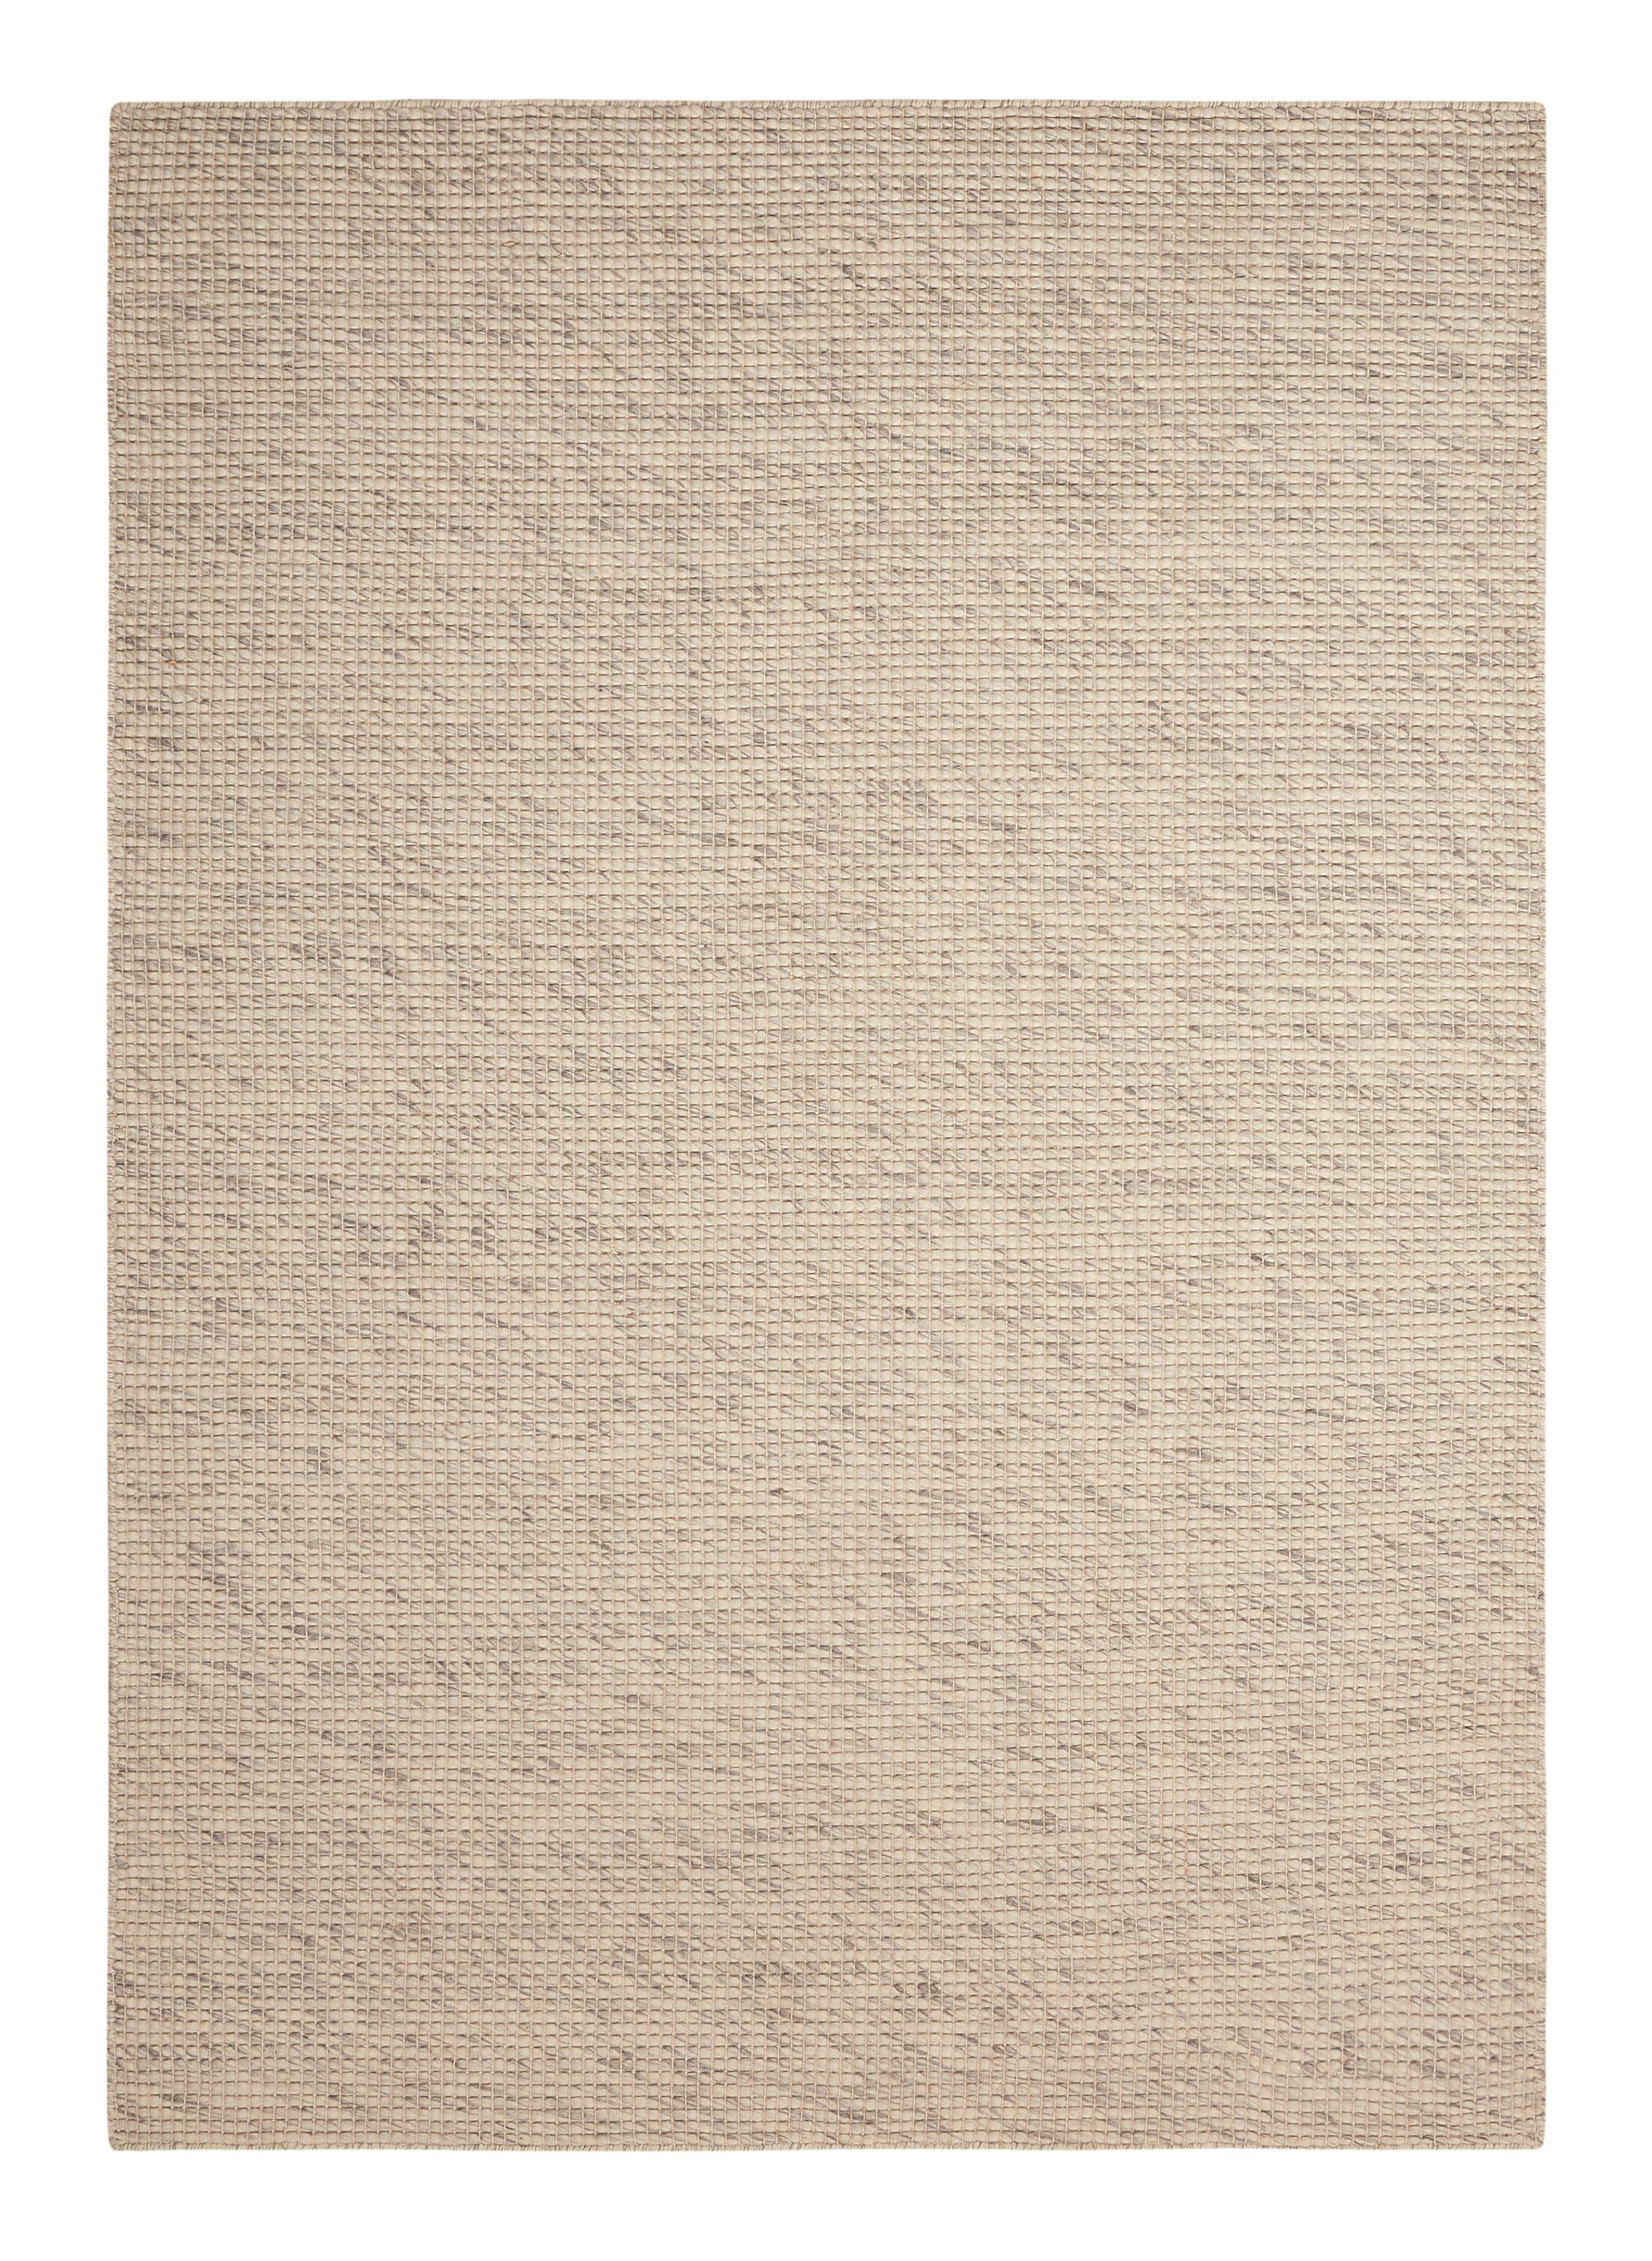 Viviana Hand-Woven Beige Area Rug Rug Size: 4' x 6'